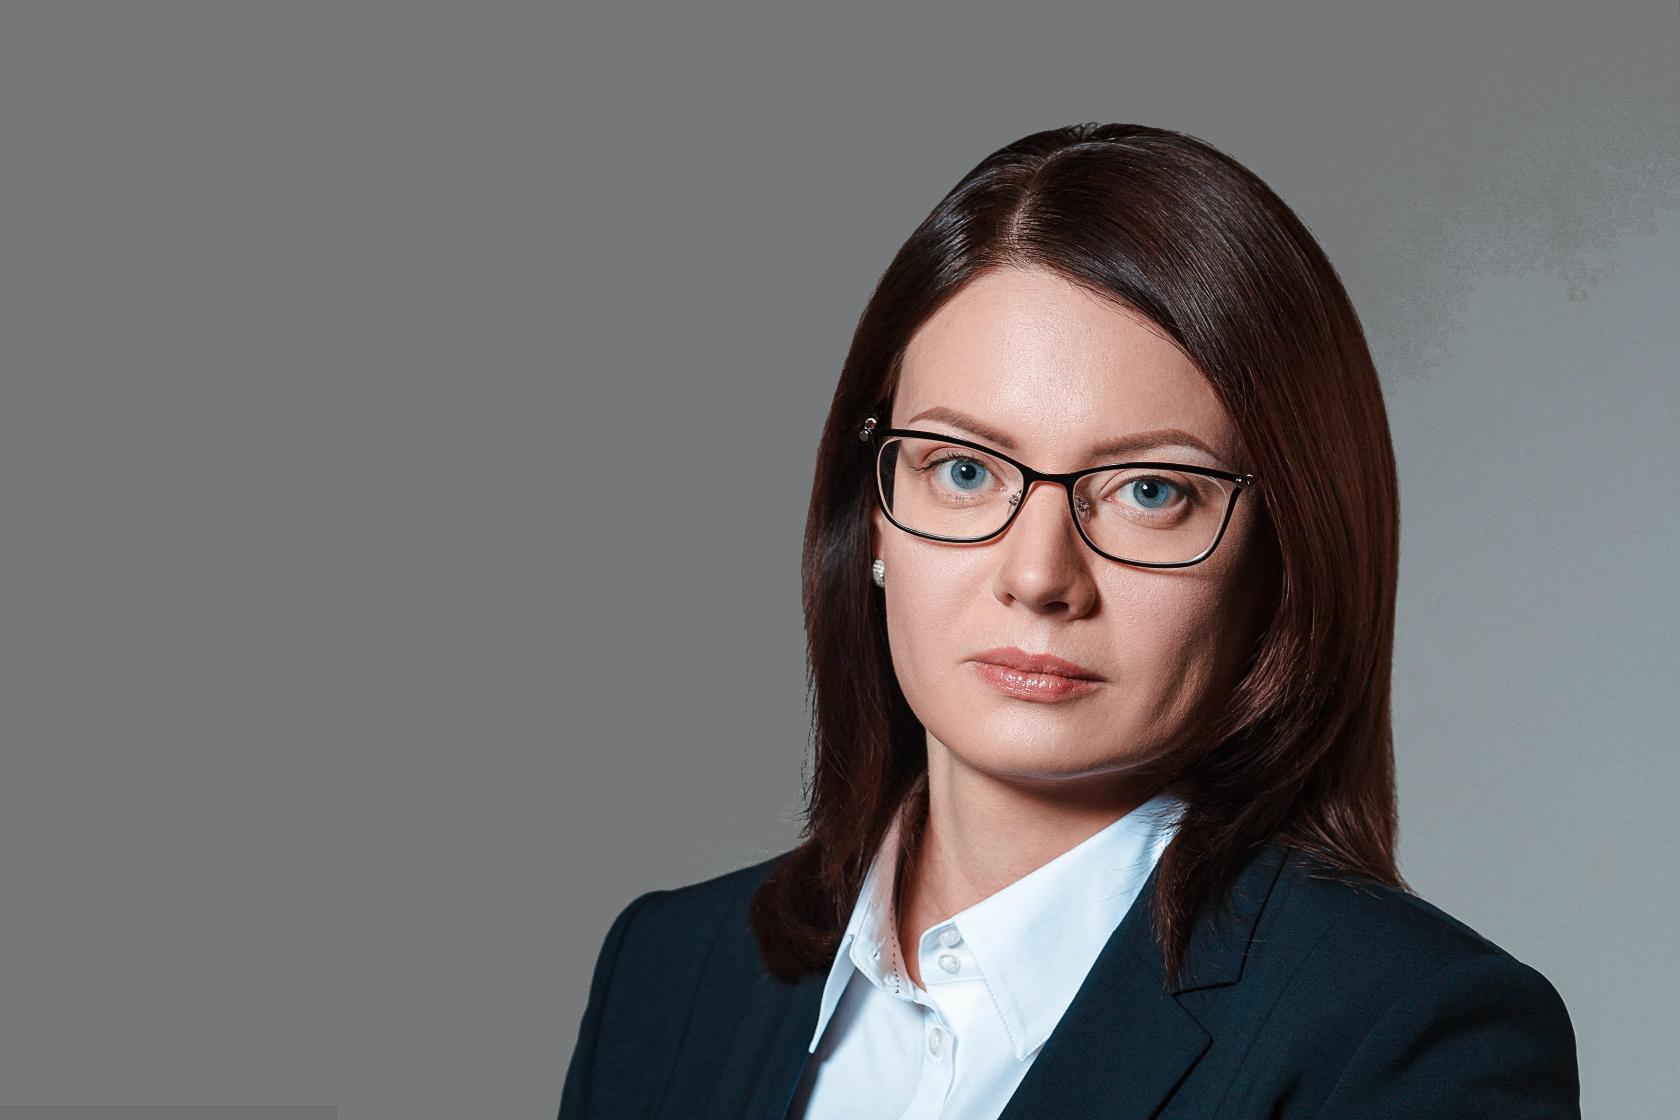 председатель совета директоров ООО «Проминвест» Александр Спиридонов